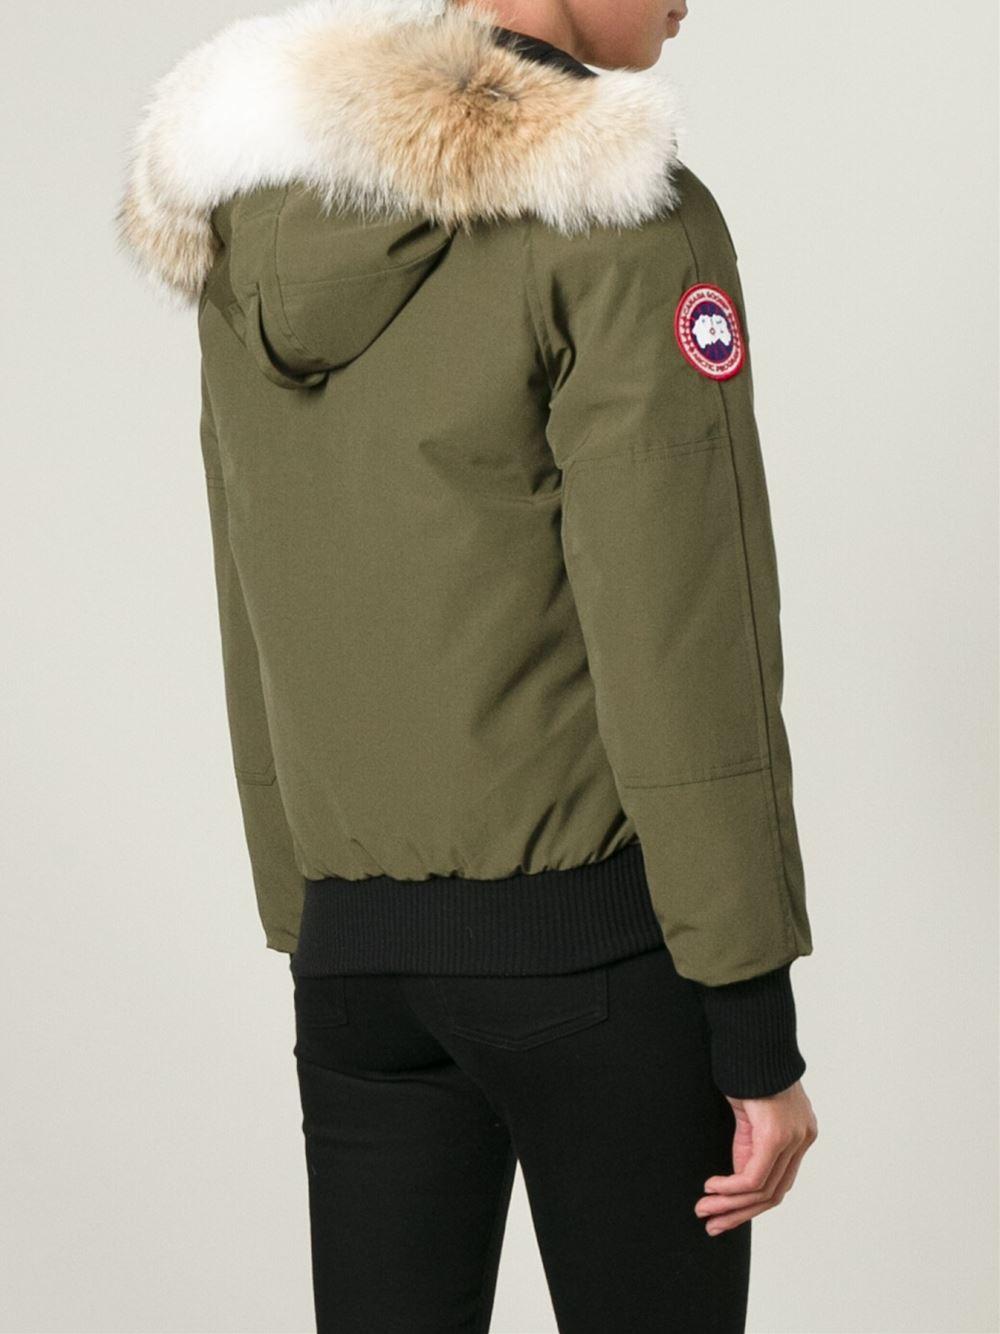 canada goose jackets harrods